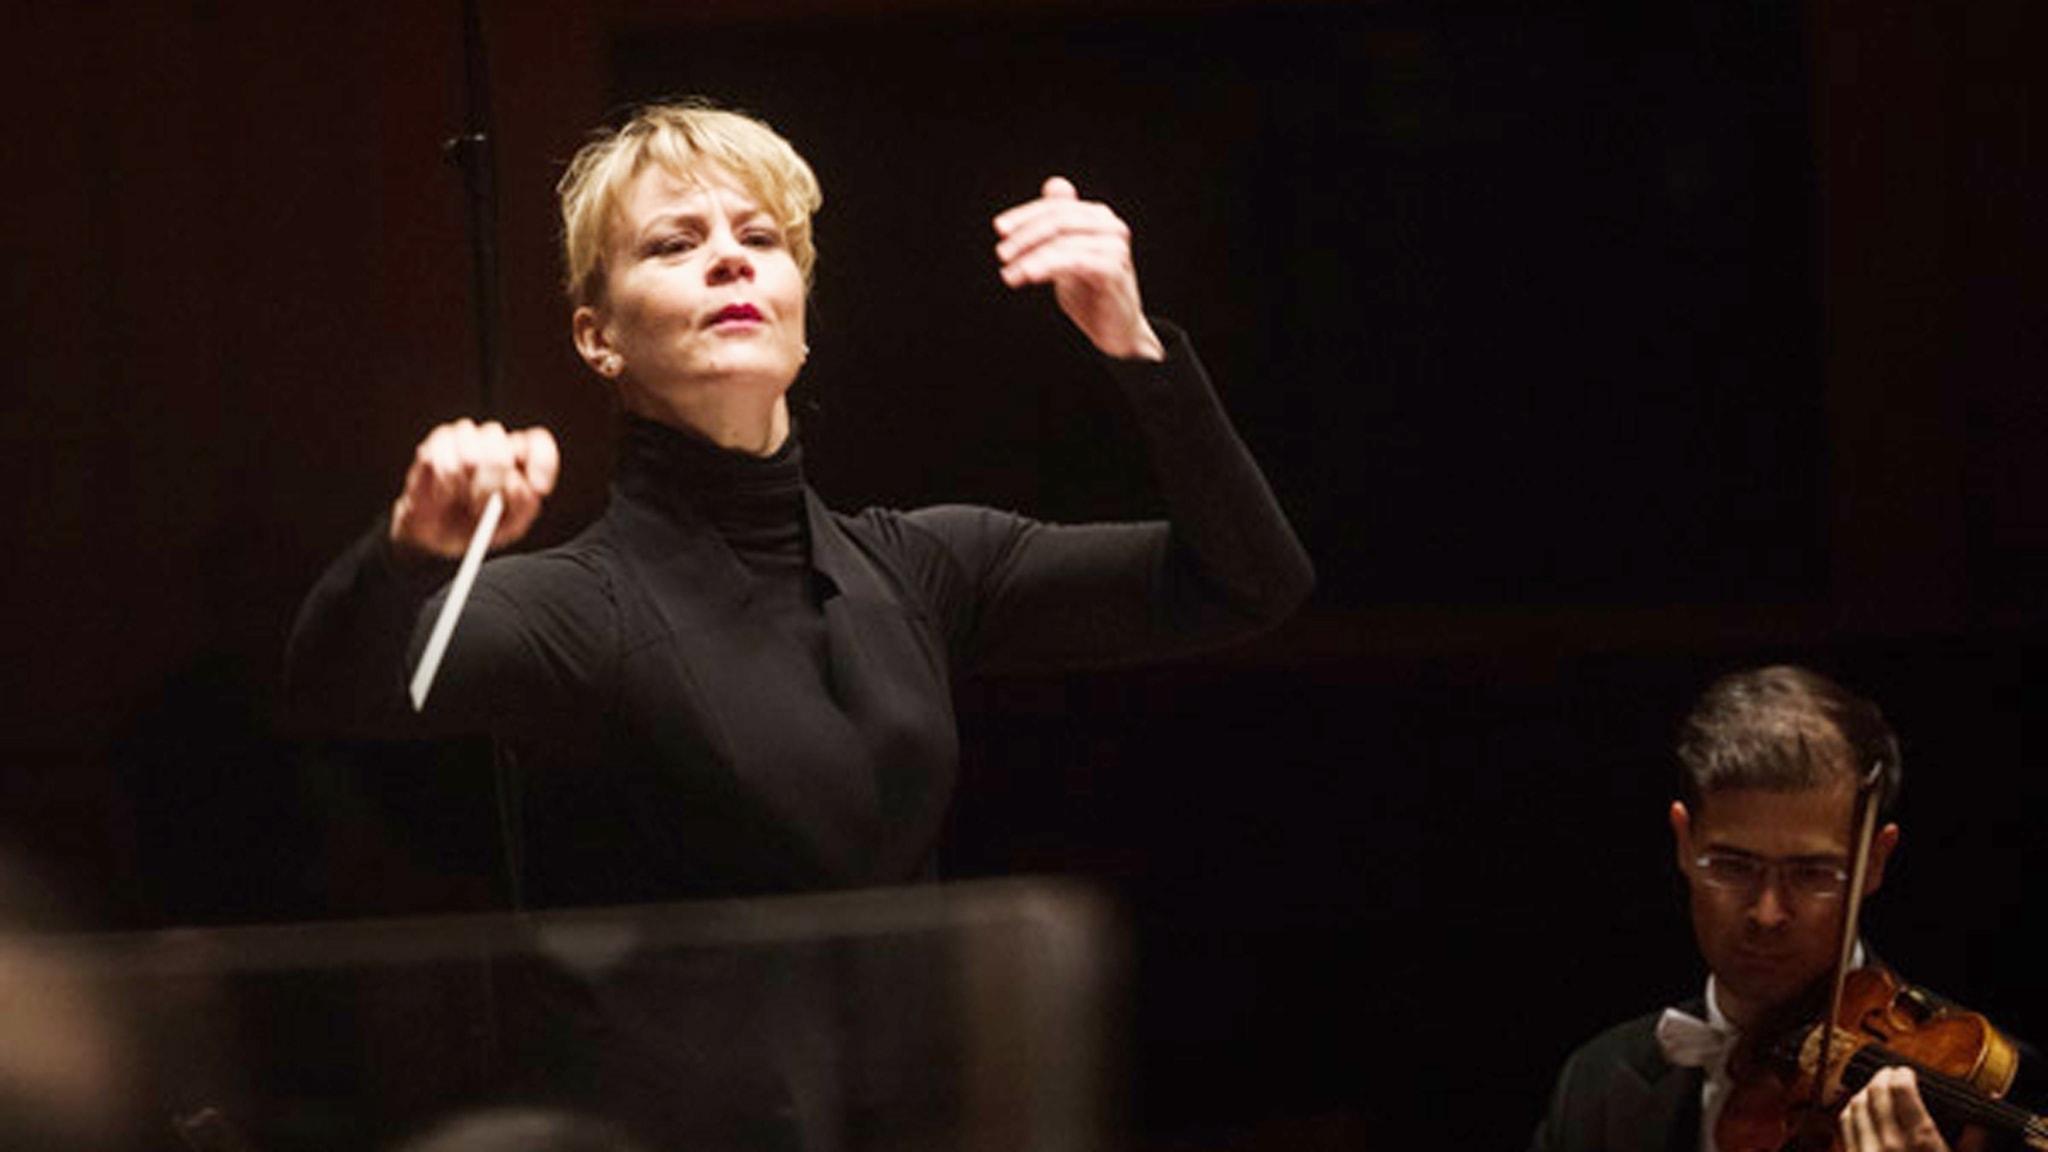 Dirigenten Susanna Mälkki. Foto: Mattias Ahlm/SR.